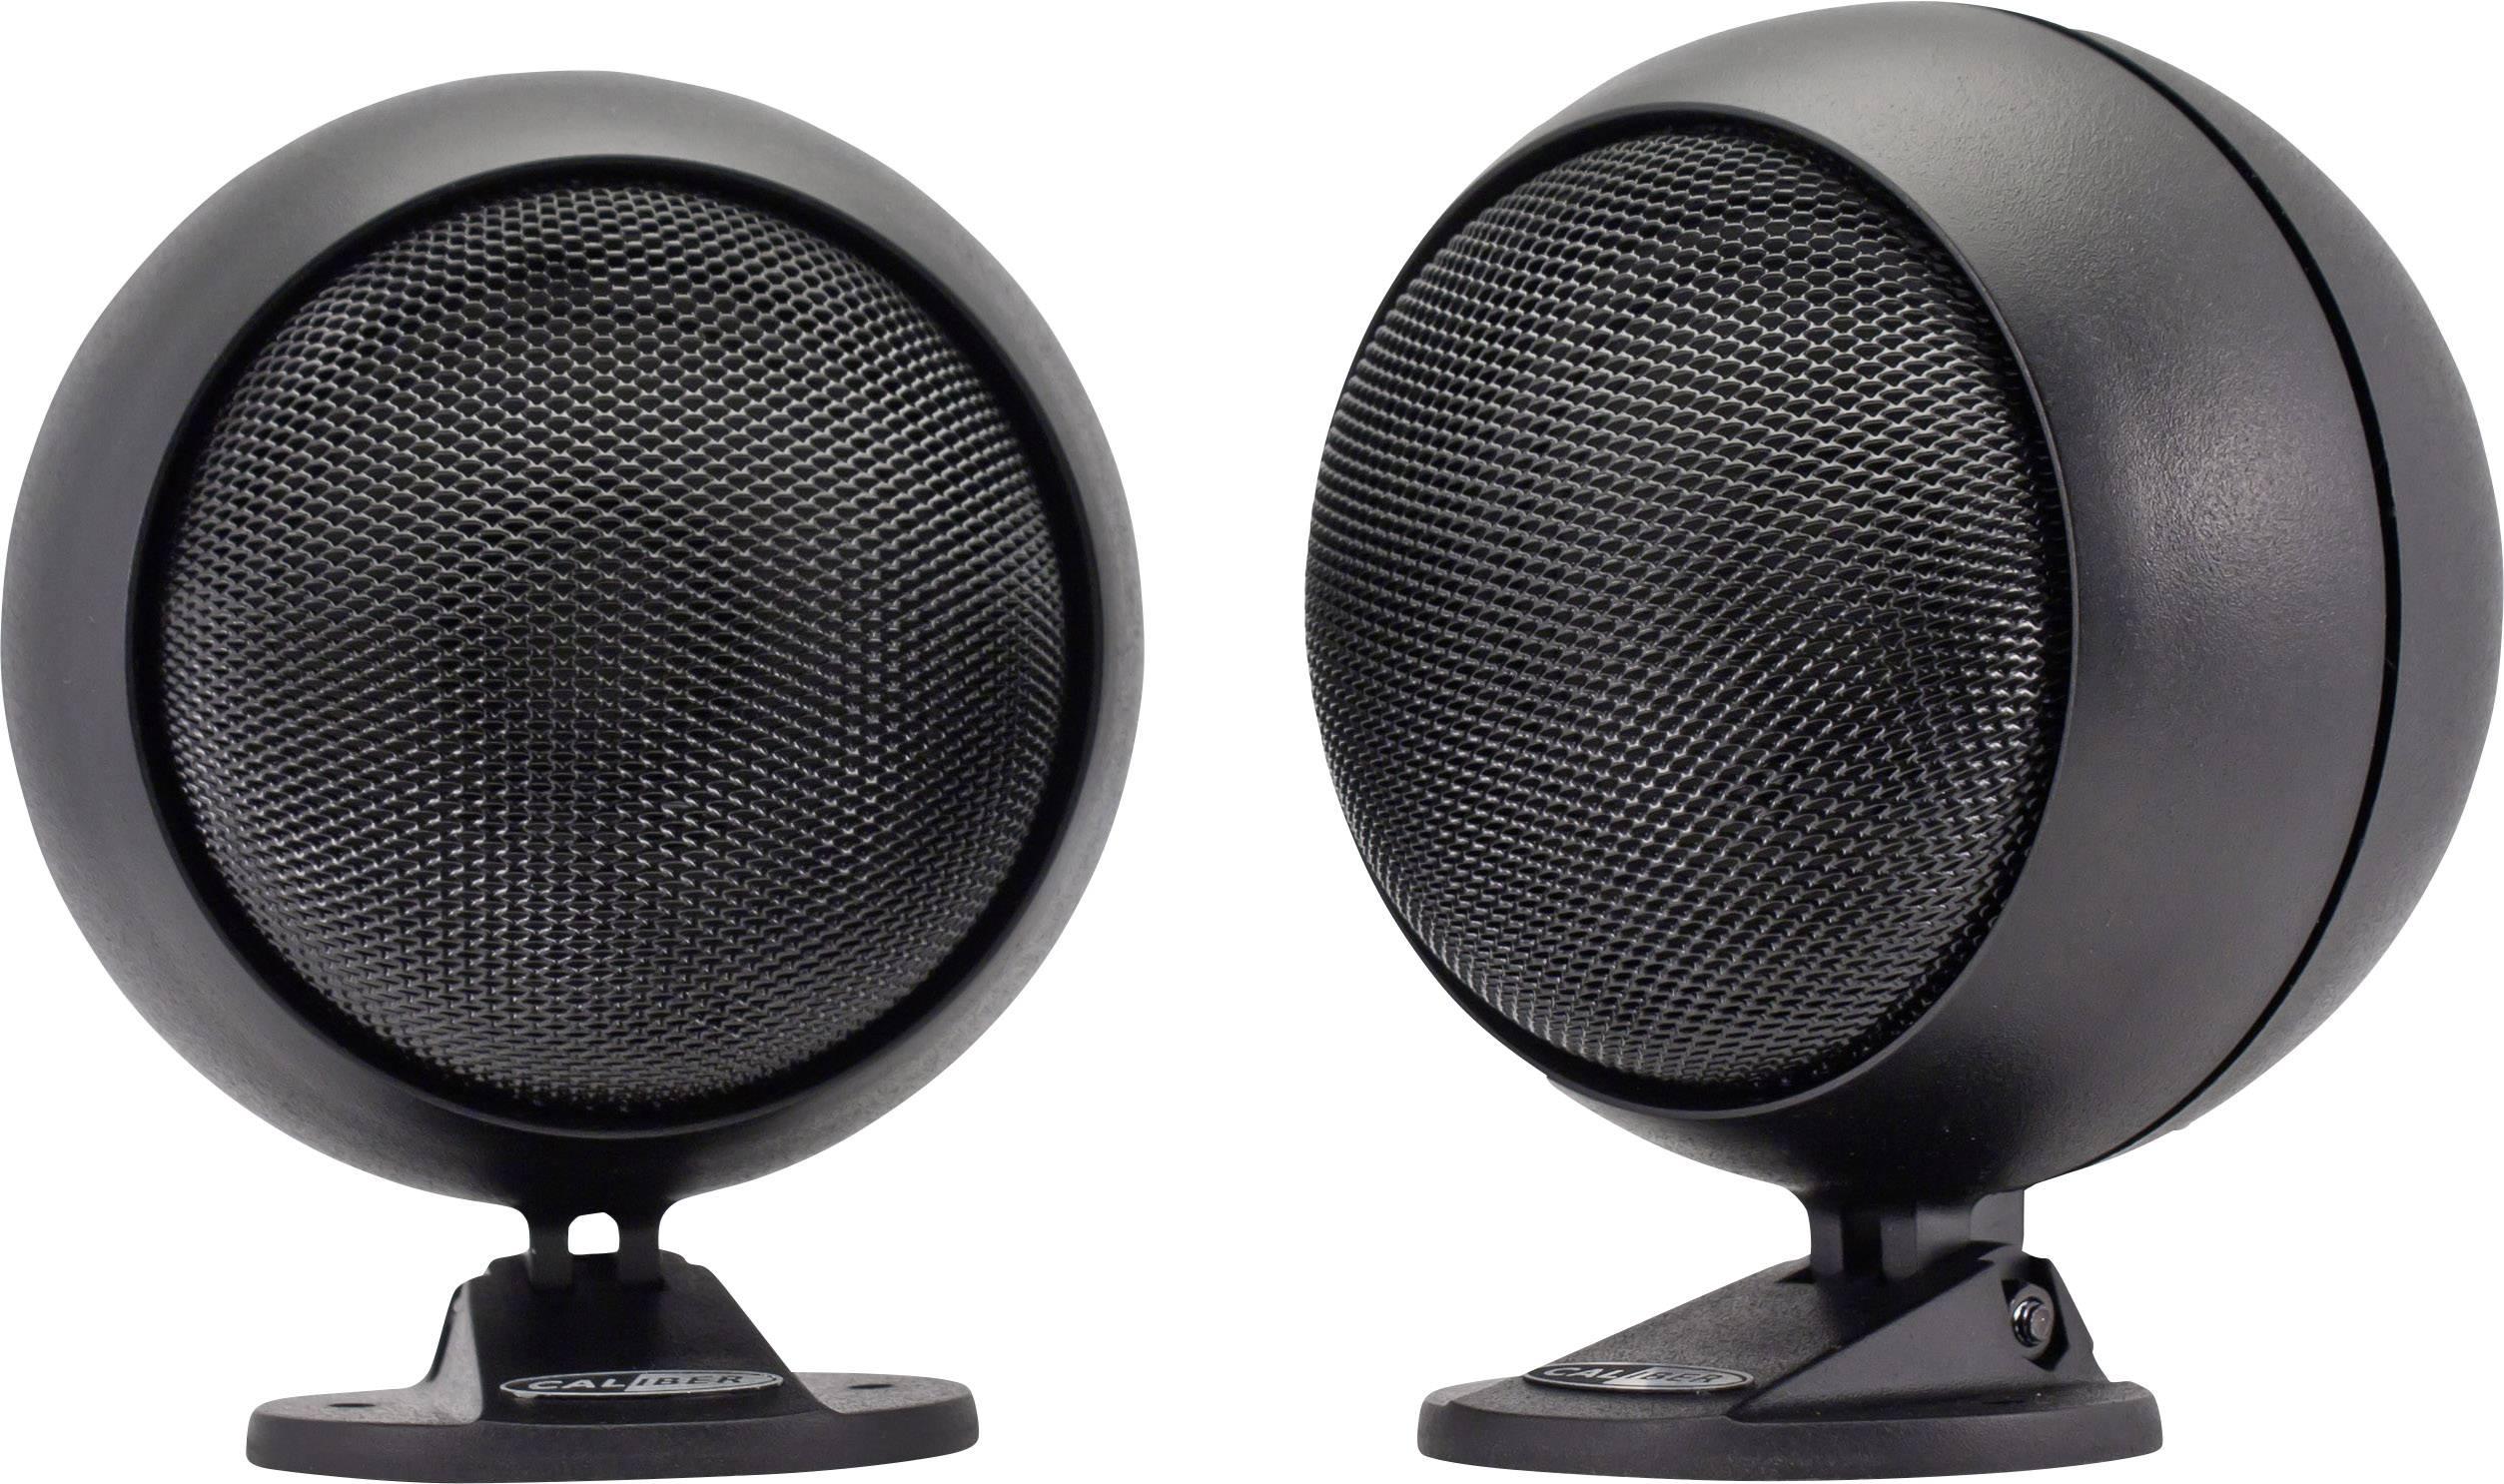 Širokopásmový reproduktor Caliber Audio Technology CSB7, 40 W, 1 pár